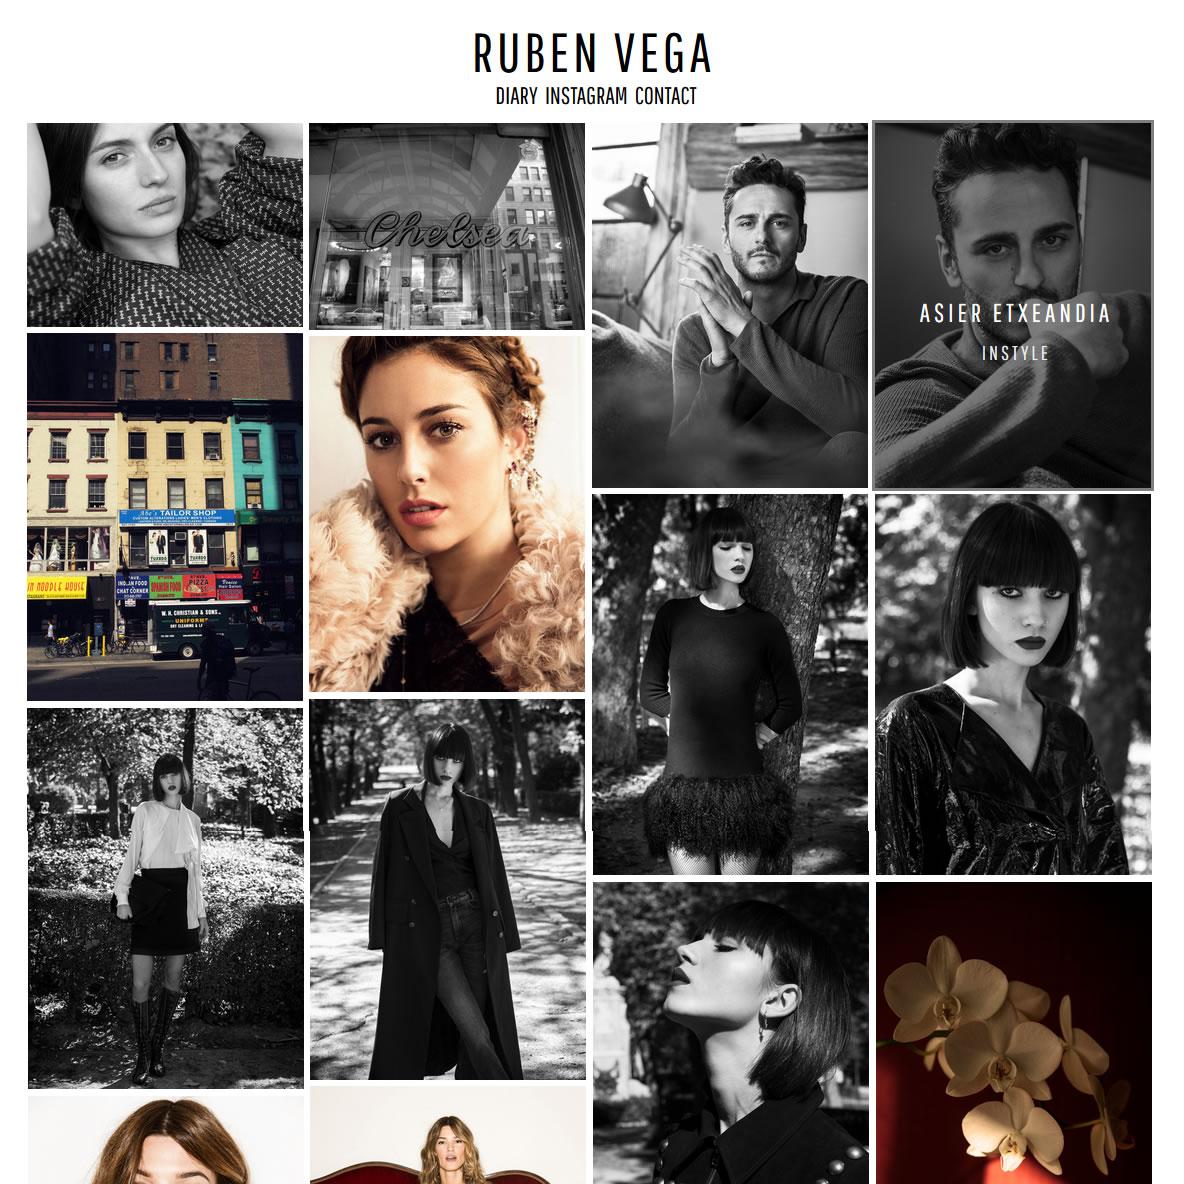 La nueva web de Rubén Vega